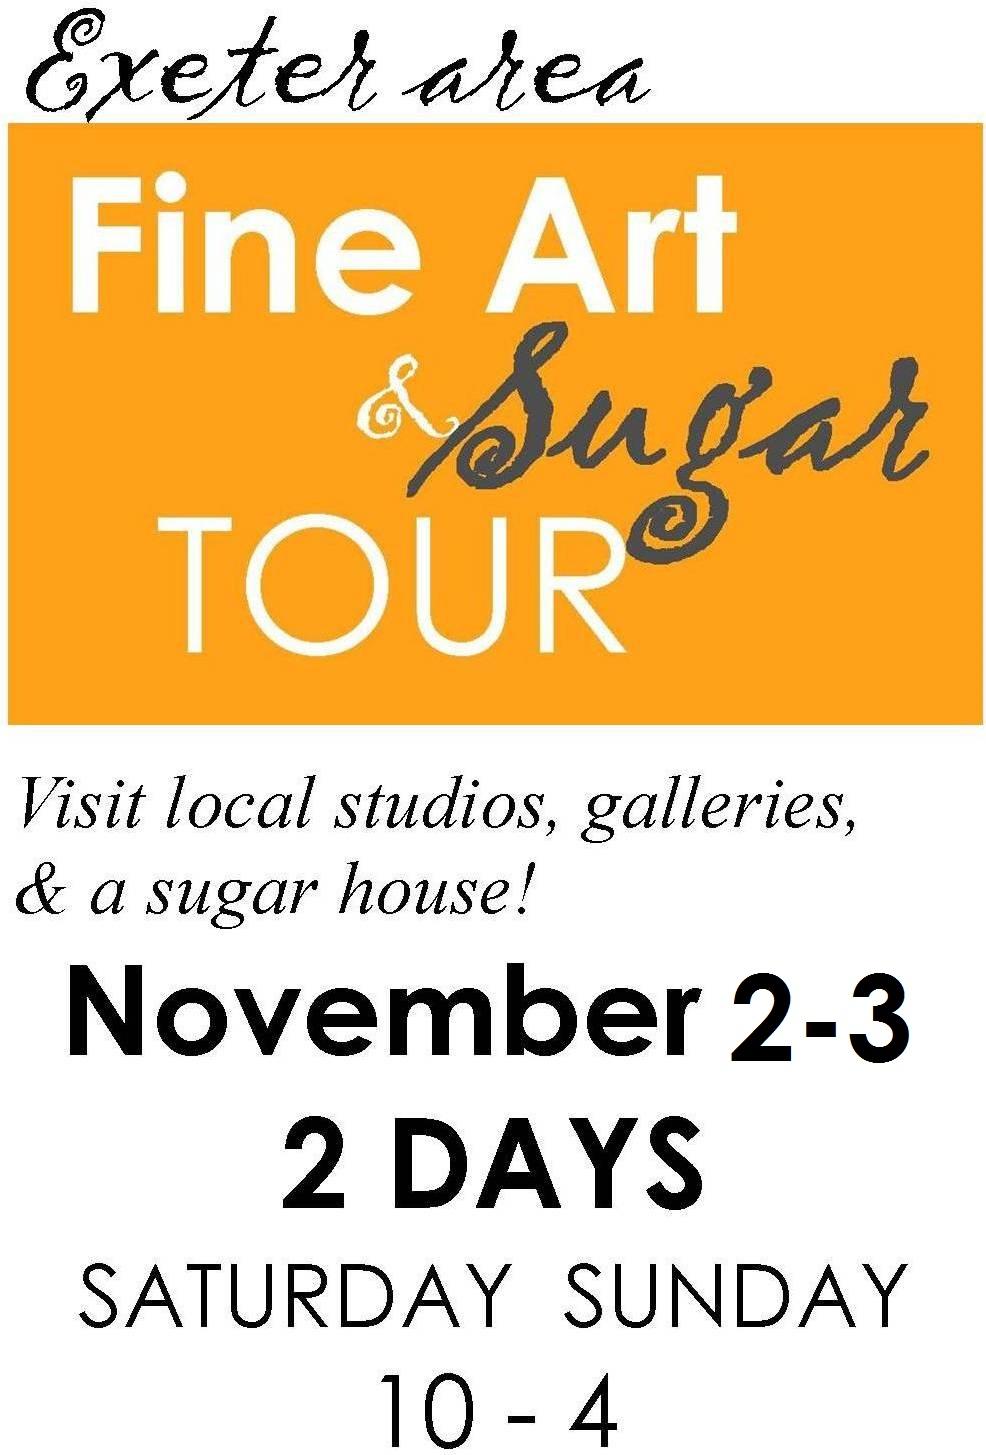 EVENT: FINE ART & SUGAR TOUR. 12 LOCATIONS!